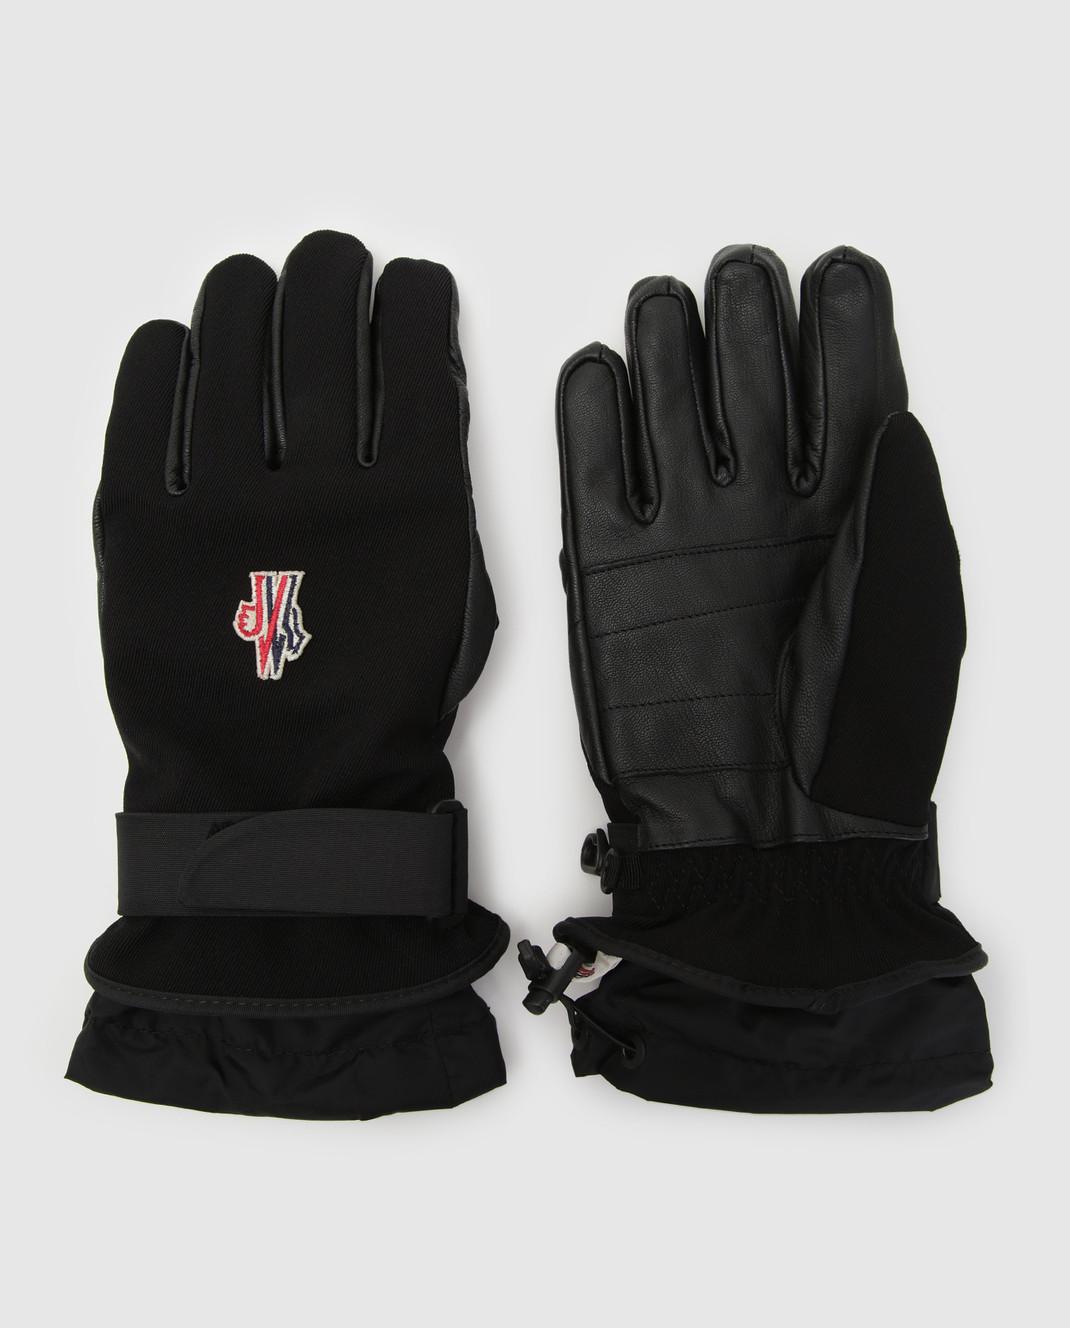 Moncler Grenoble Черные перчатки 00524